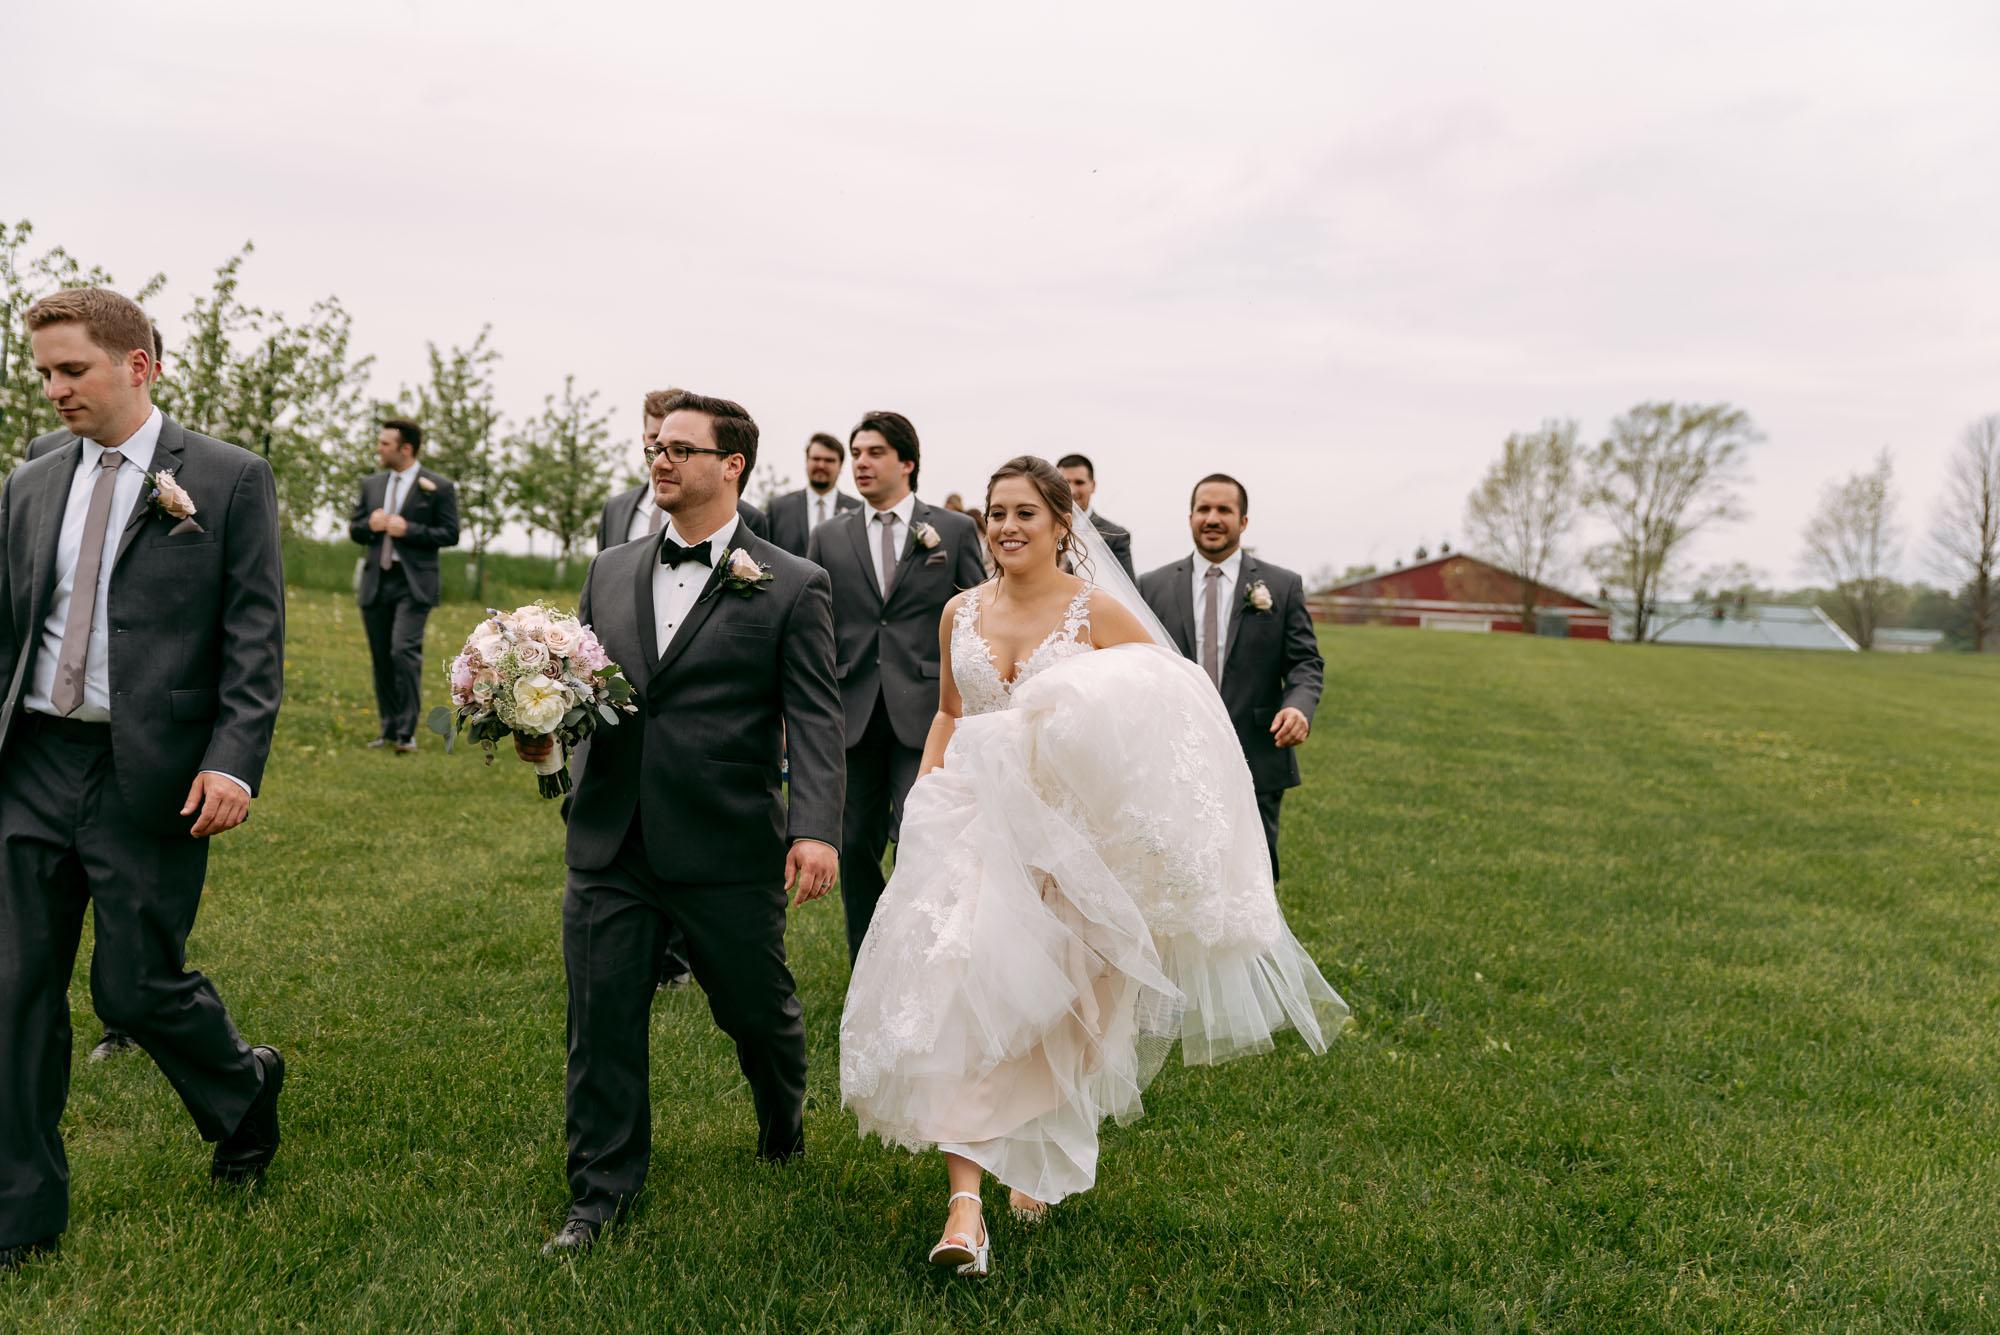 orchard-farms-pavillion-wedding-rockton-IL-wedding-photographers-113.jpg